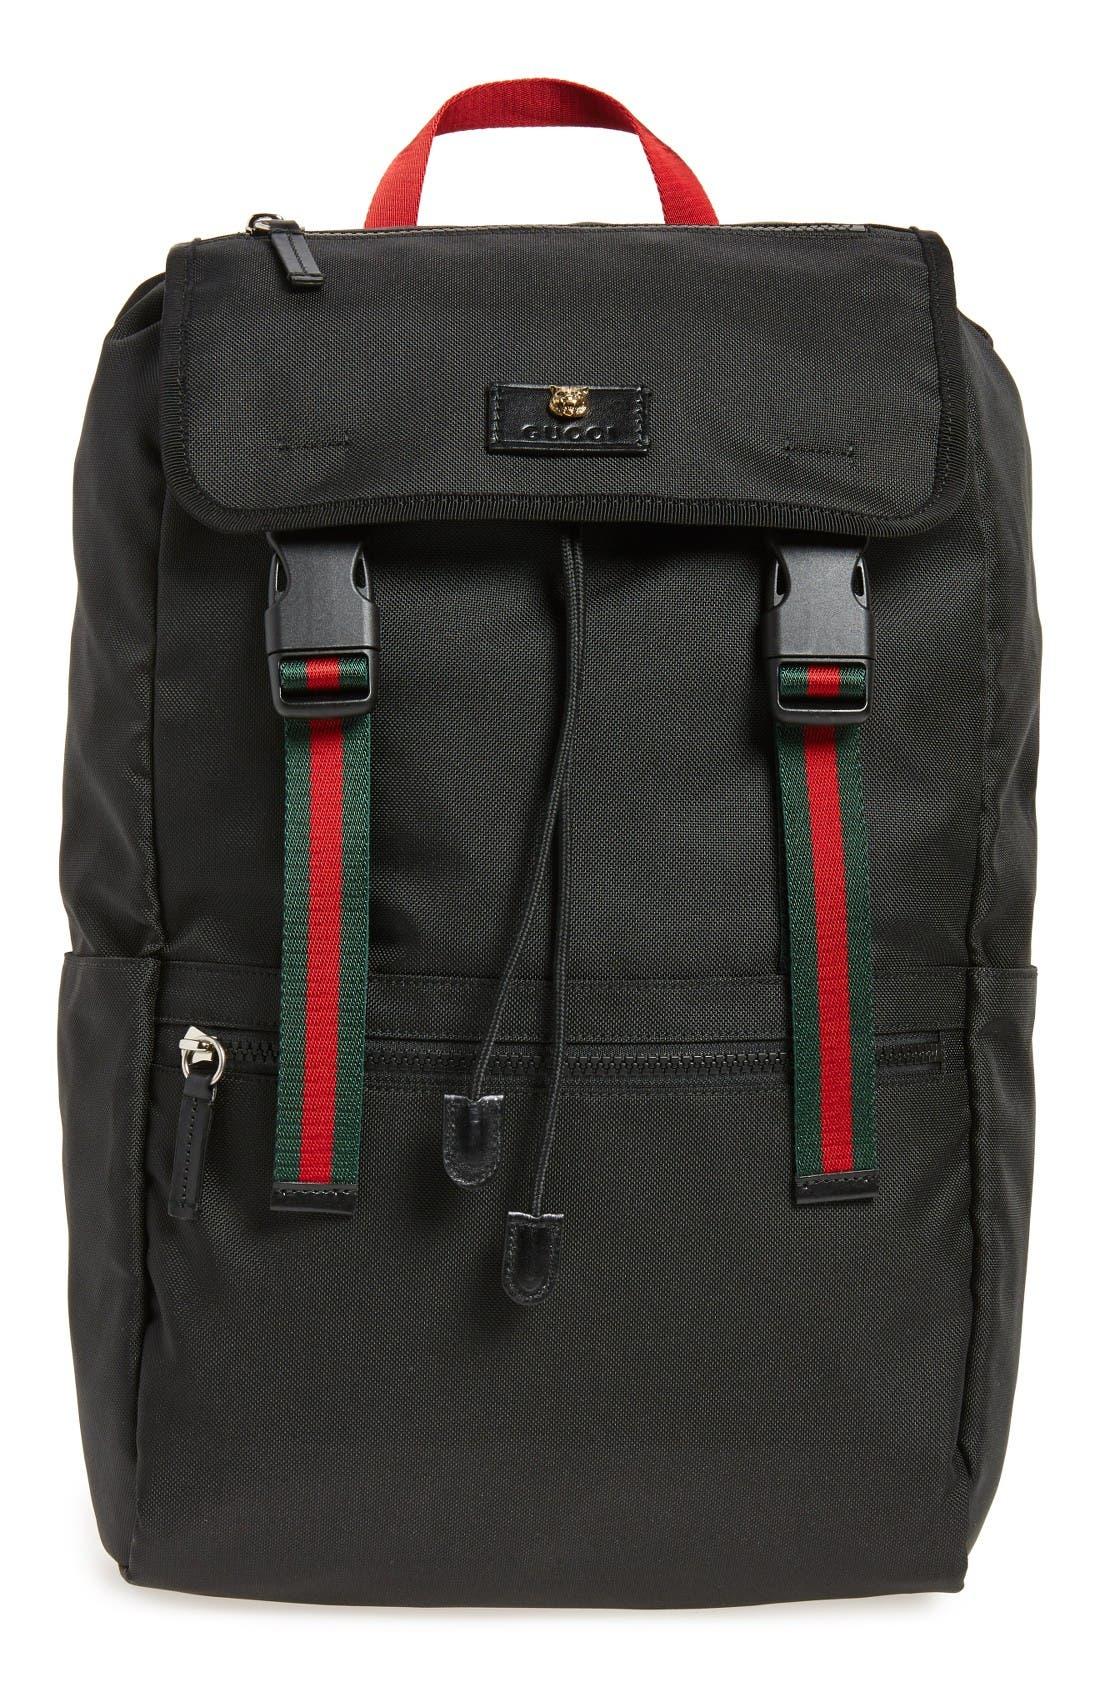 Gucci рюкзак фото рюкзак для металлоискателя купить в спб